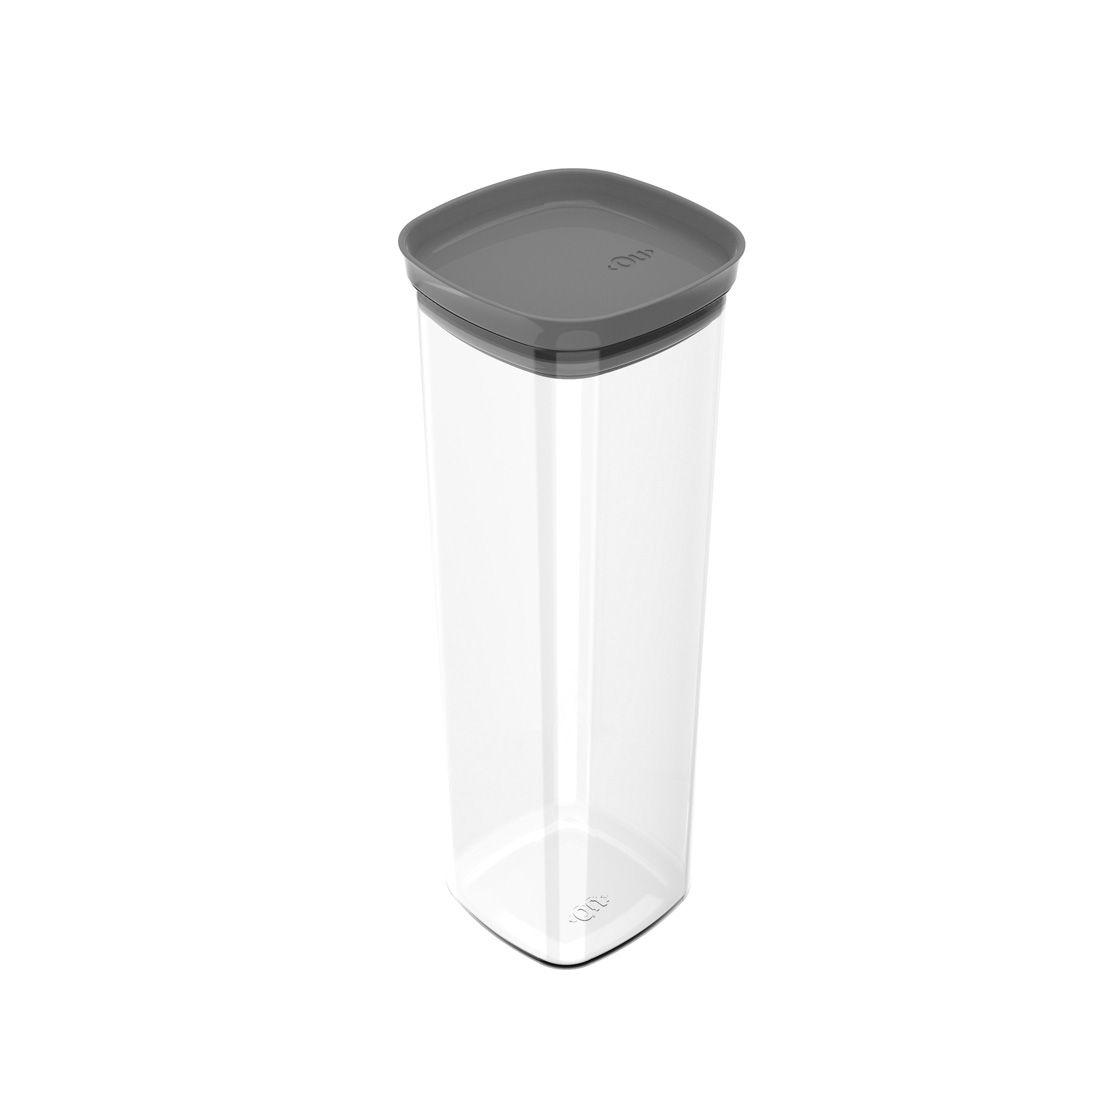 Pote 2L de Plástico com Tampa Hermética Block Chumbo